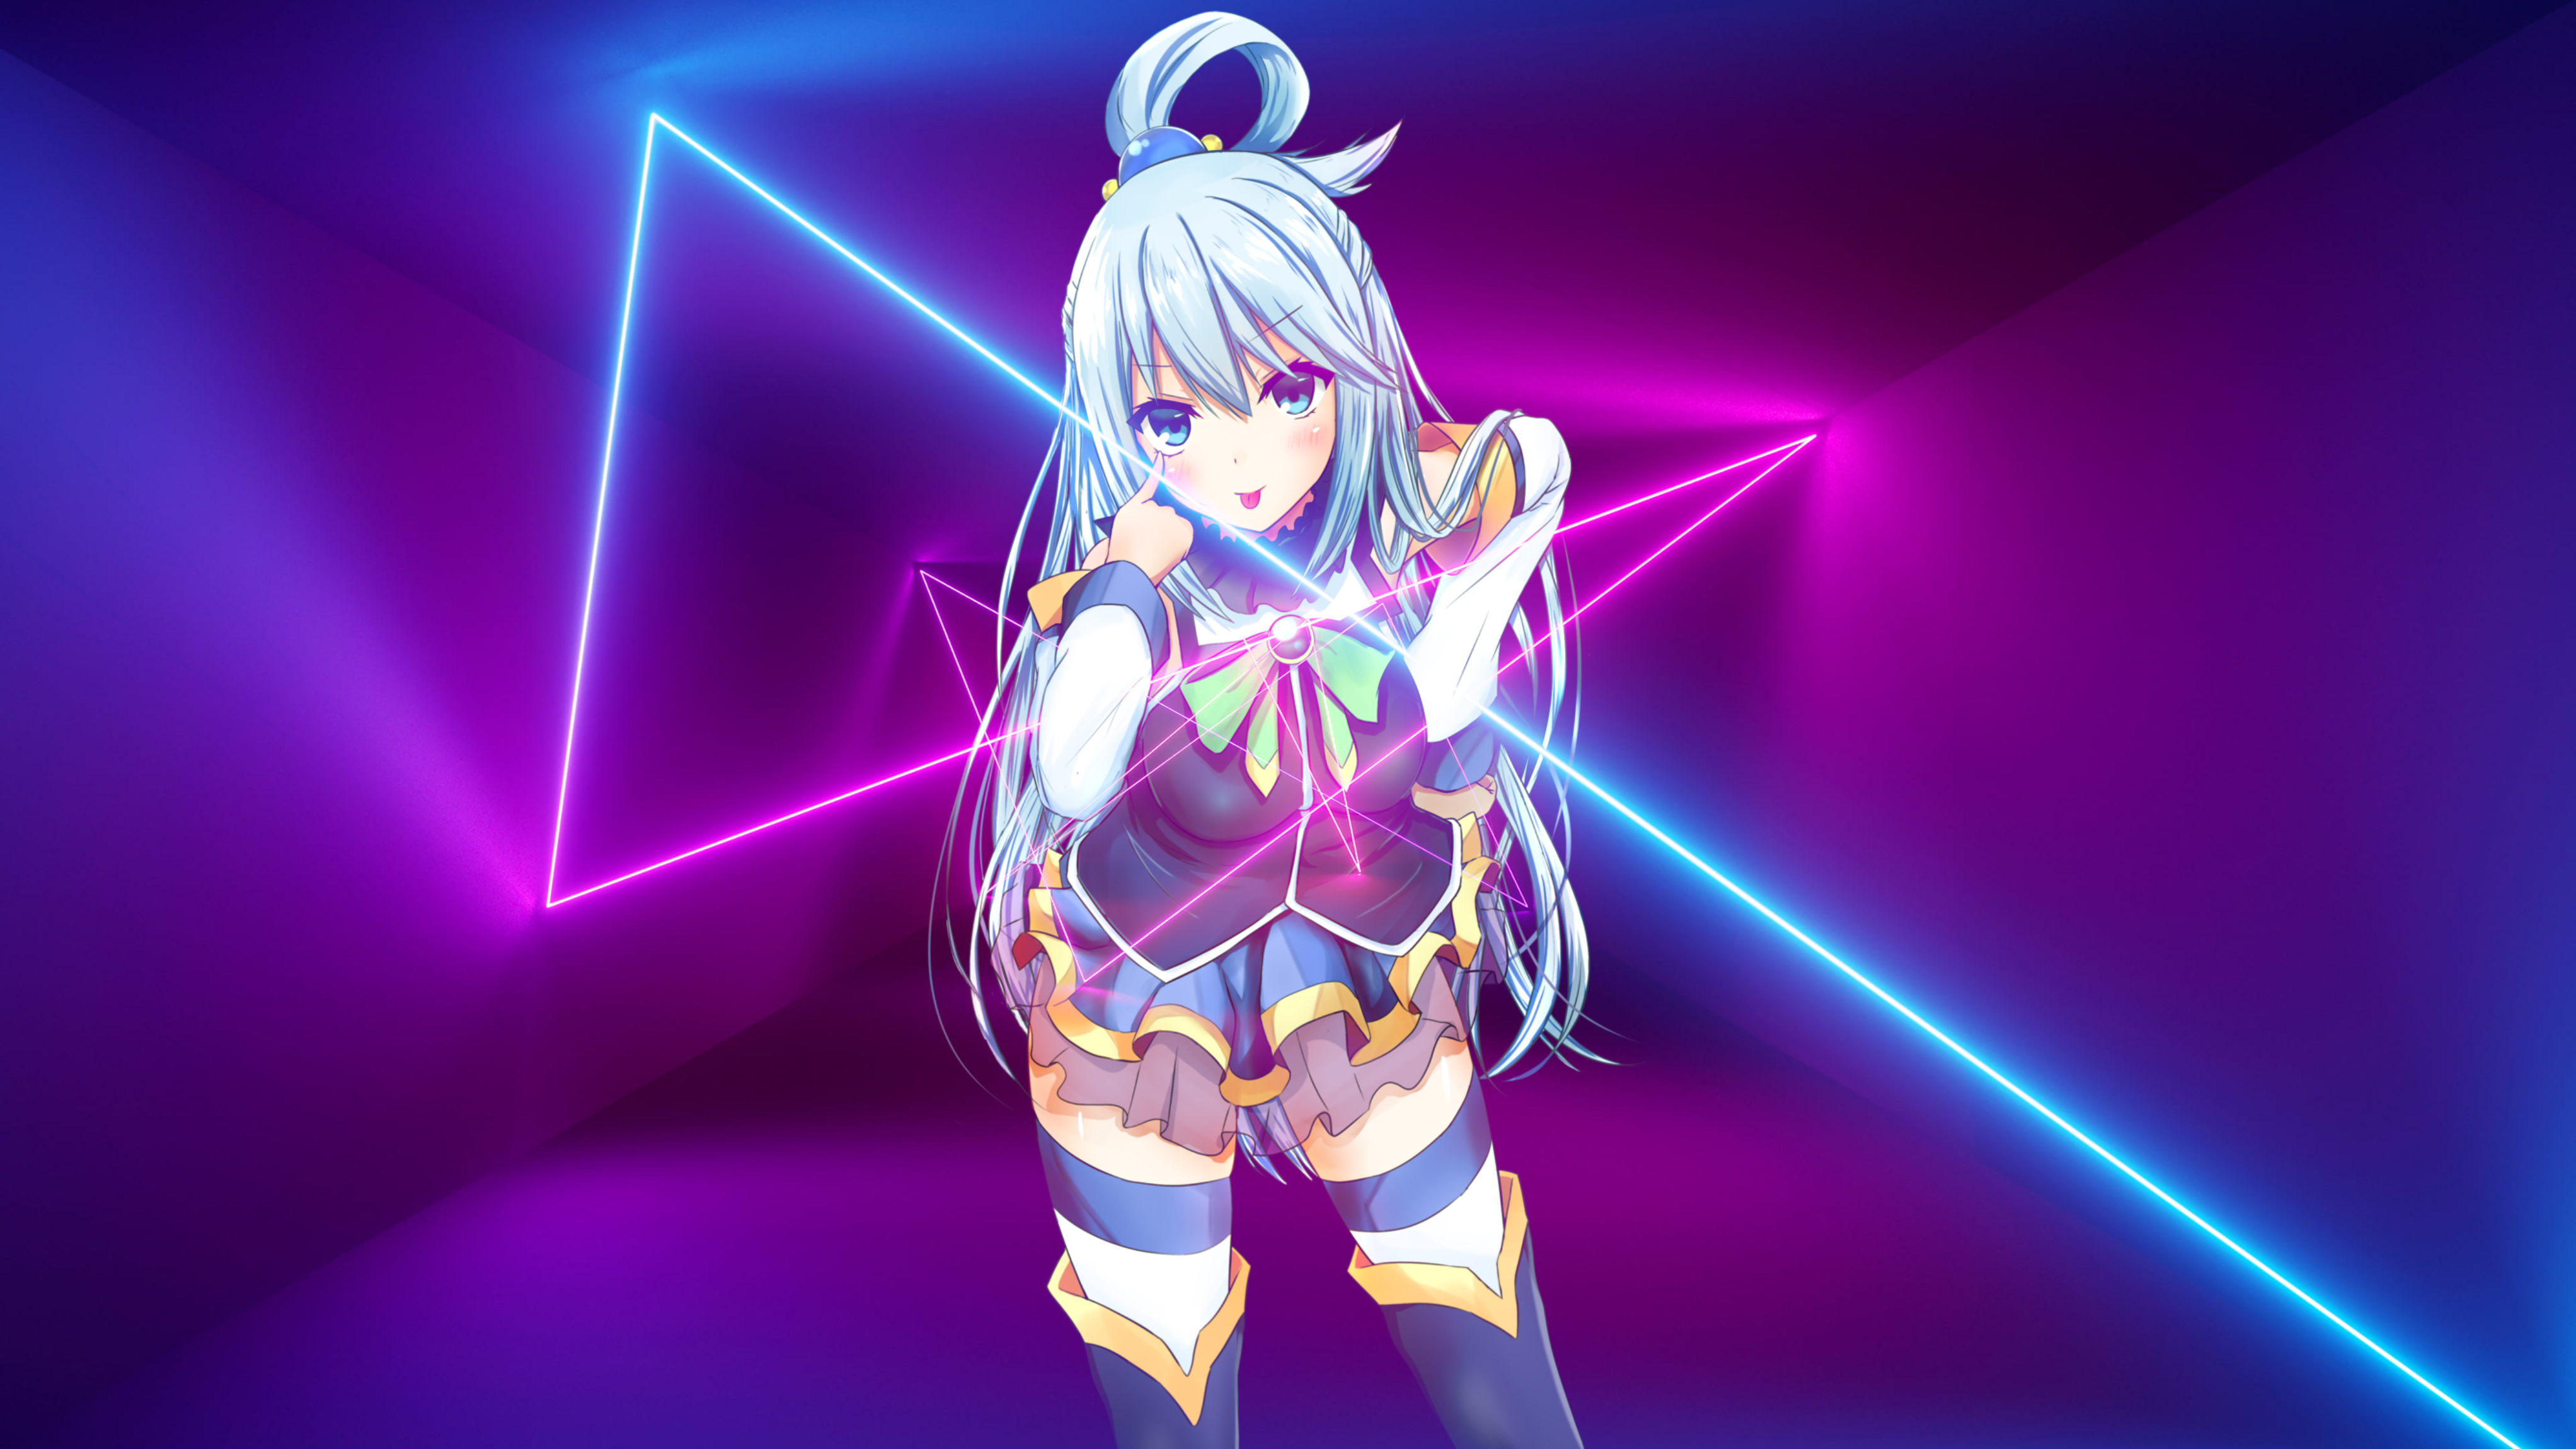 Anime 4088x2300 anime girls Aqua (KonoSuba) picture-in-picture synthwave Retrowave vaporwave